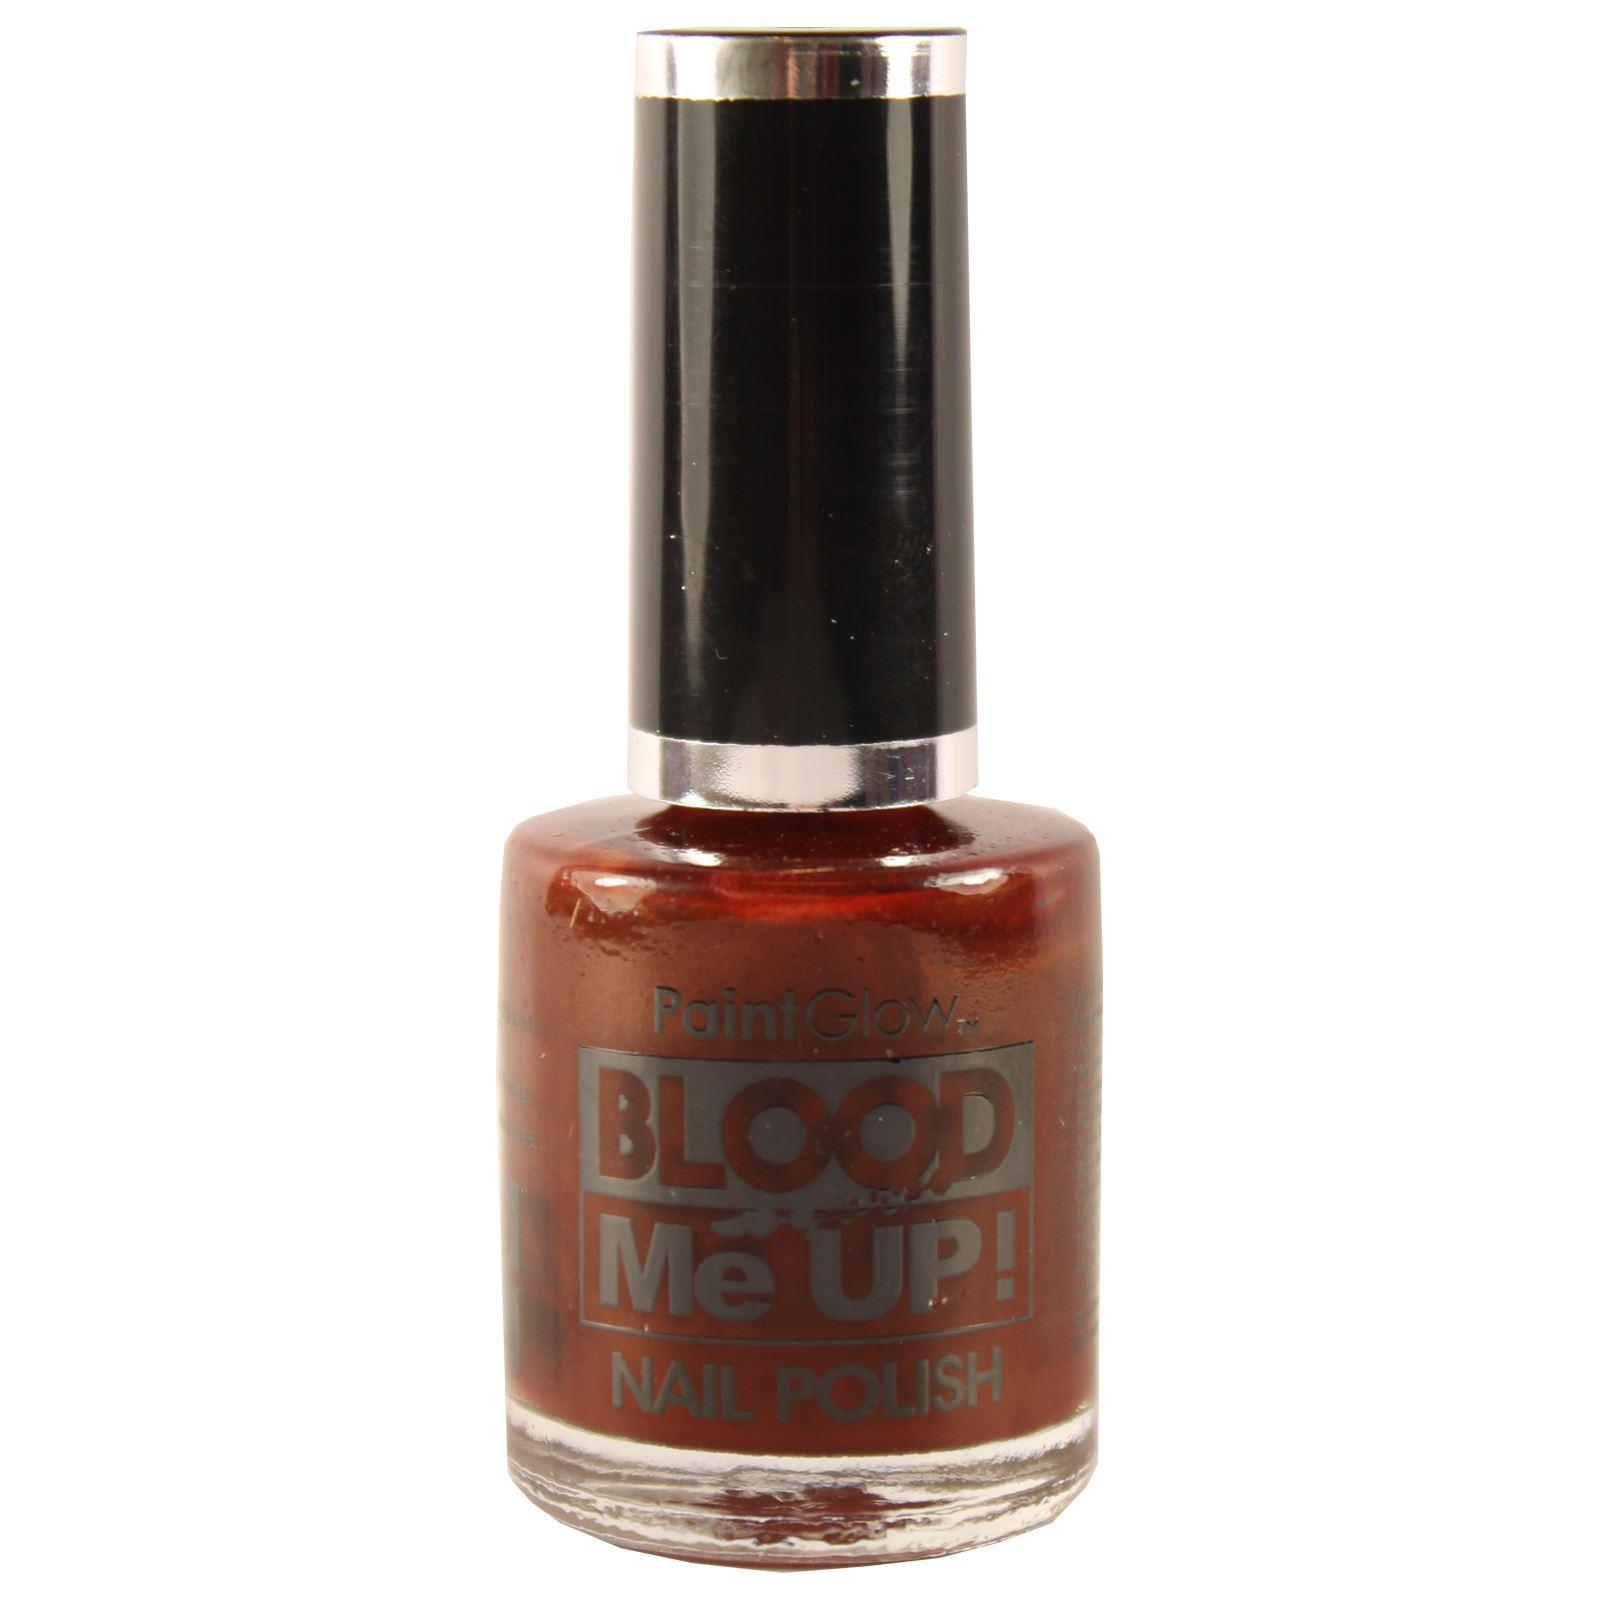 Dark Red Nail Polish PaintGlow Blood Me Up Varnish Once Coat Hard ...